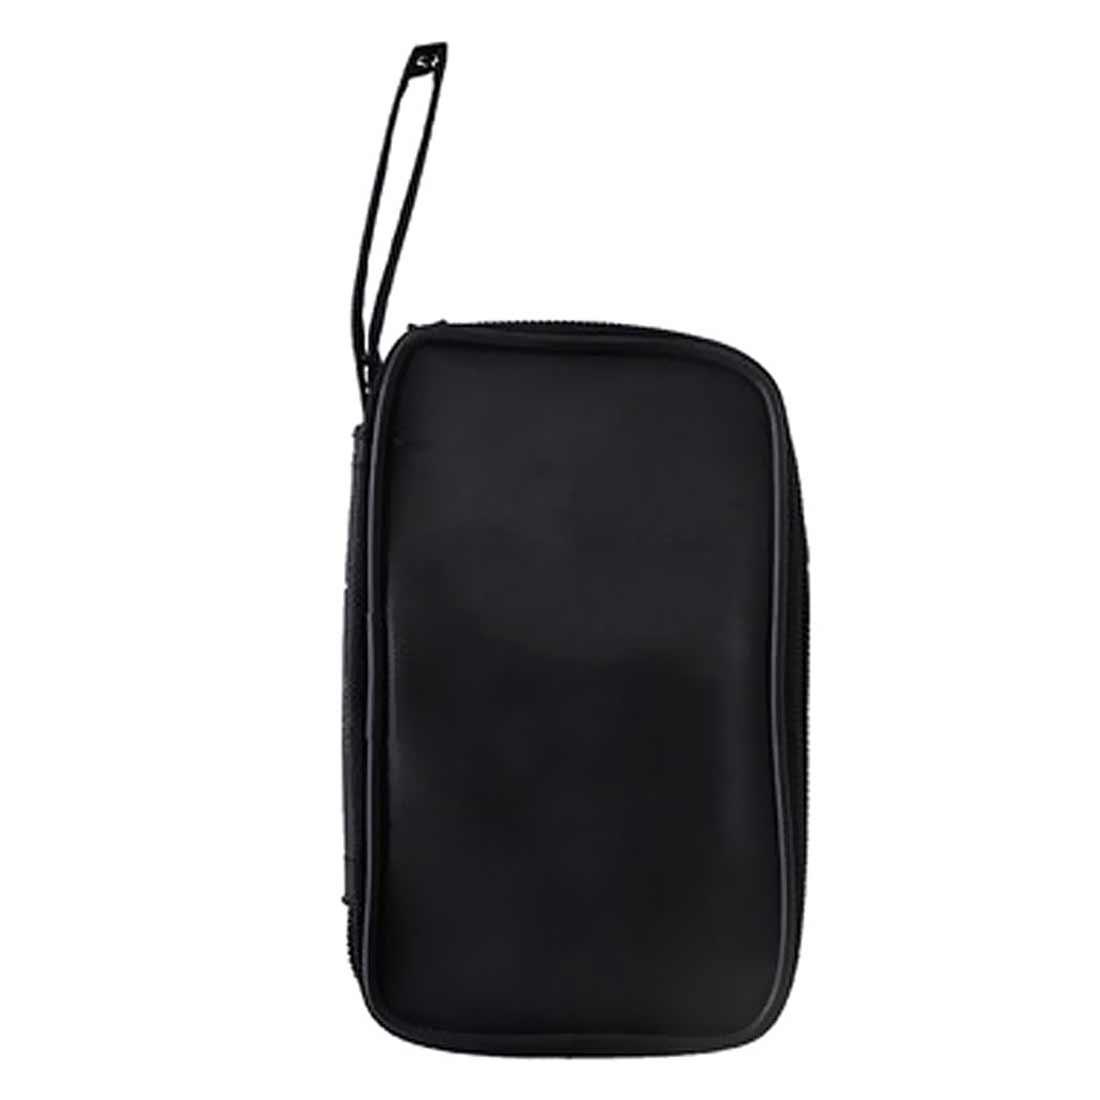 Impermeable carcasa blanda a prueba de golpes 23x14x5cm multímetro negro tela bolsa resistente bolsa de herramientas